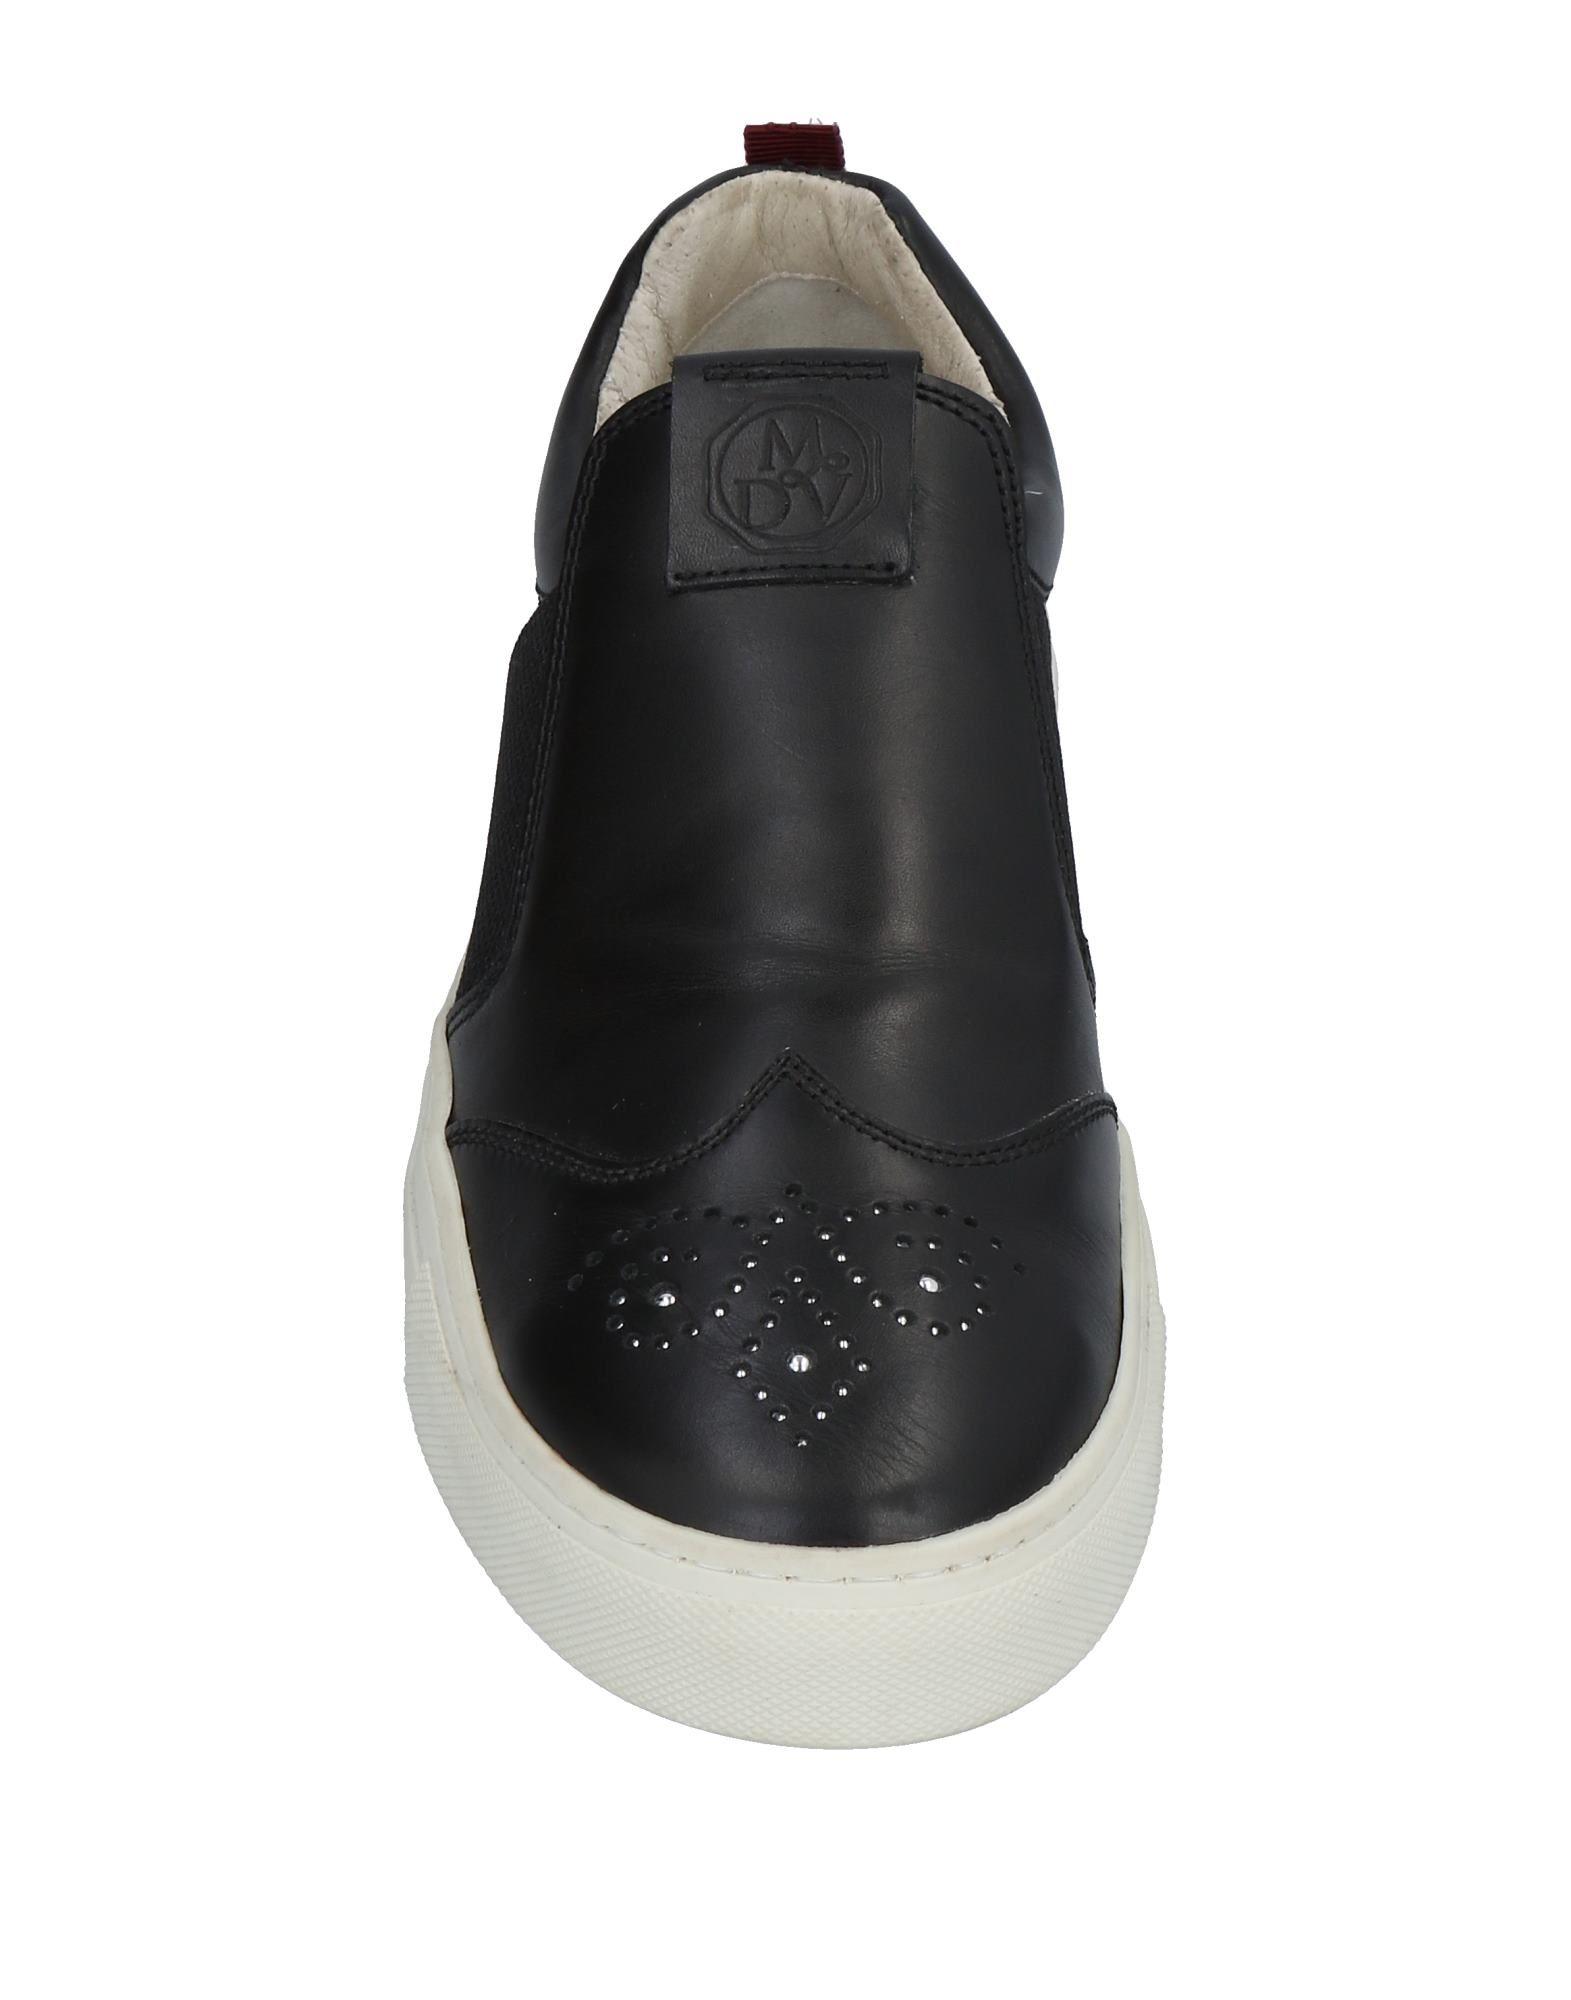 Mariano Di Vaio Sneakers Herren  11477477HS 11477477HS 11477477HS 951b8c